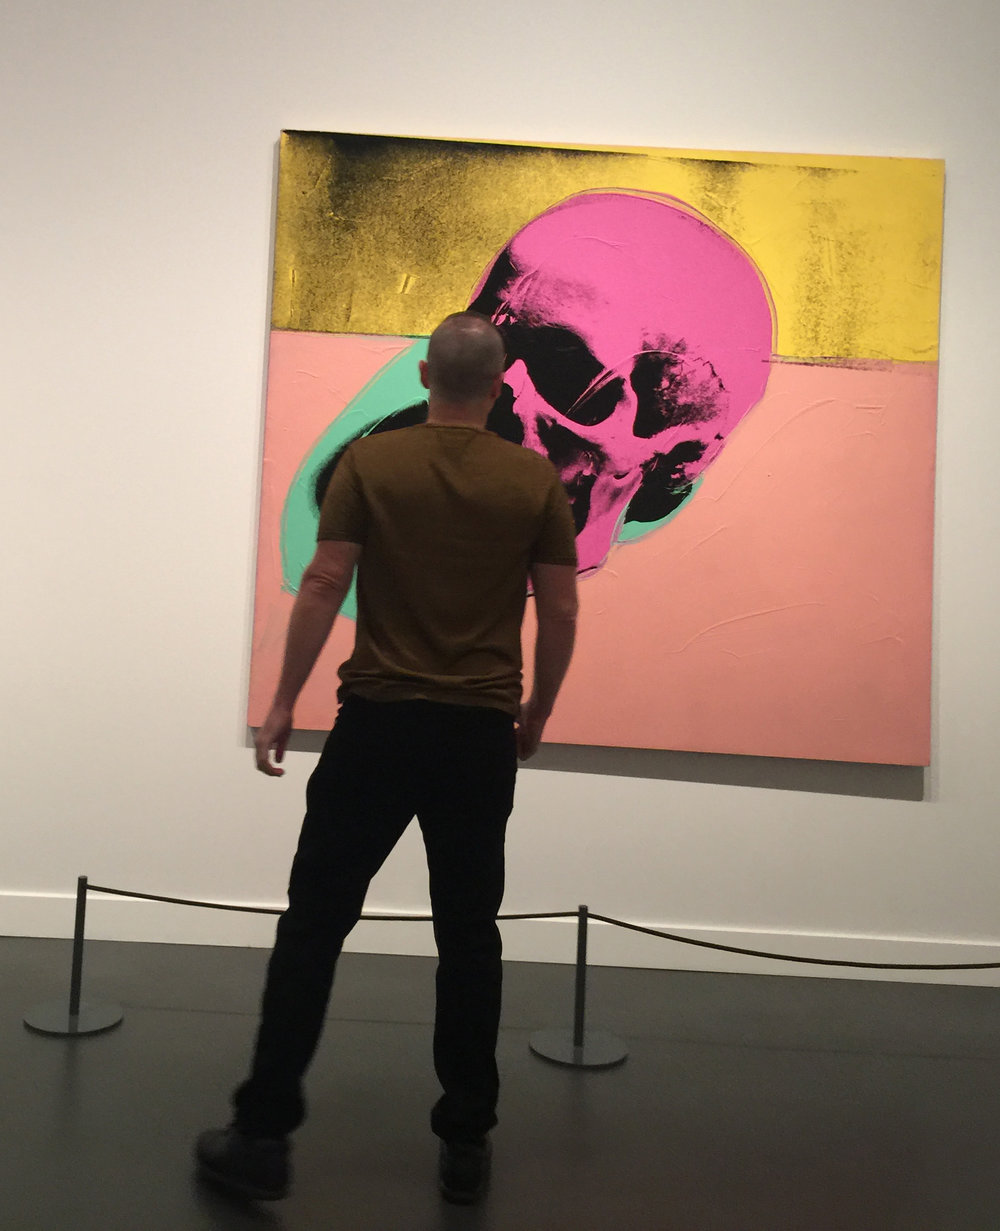 JESSE WAUGH - ANDY WARHOL - Skull